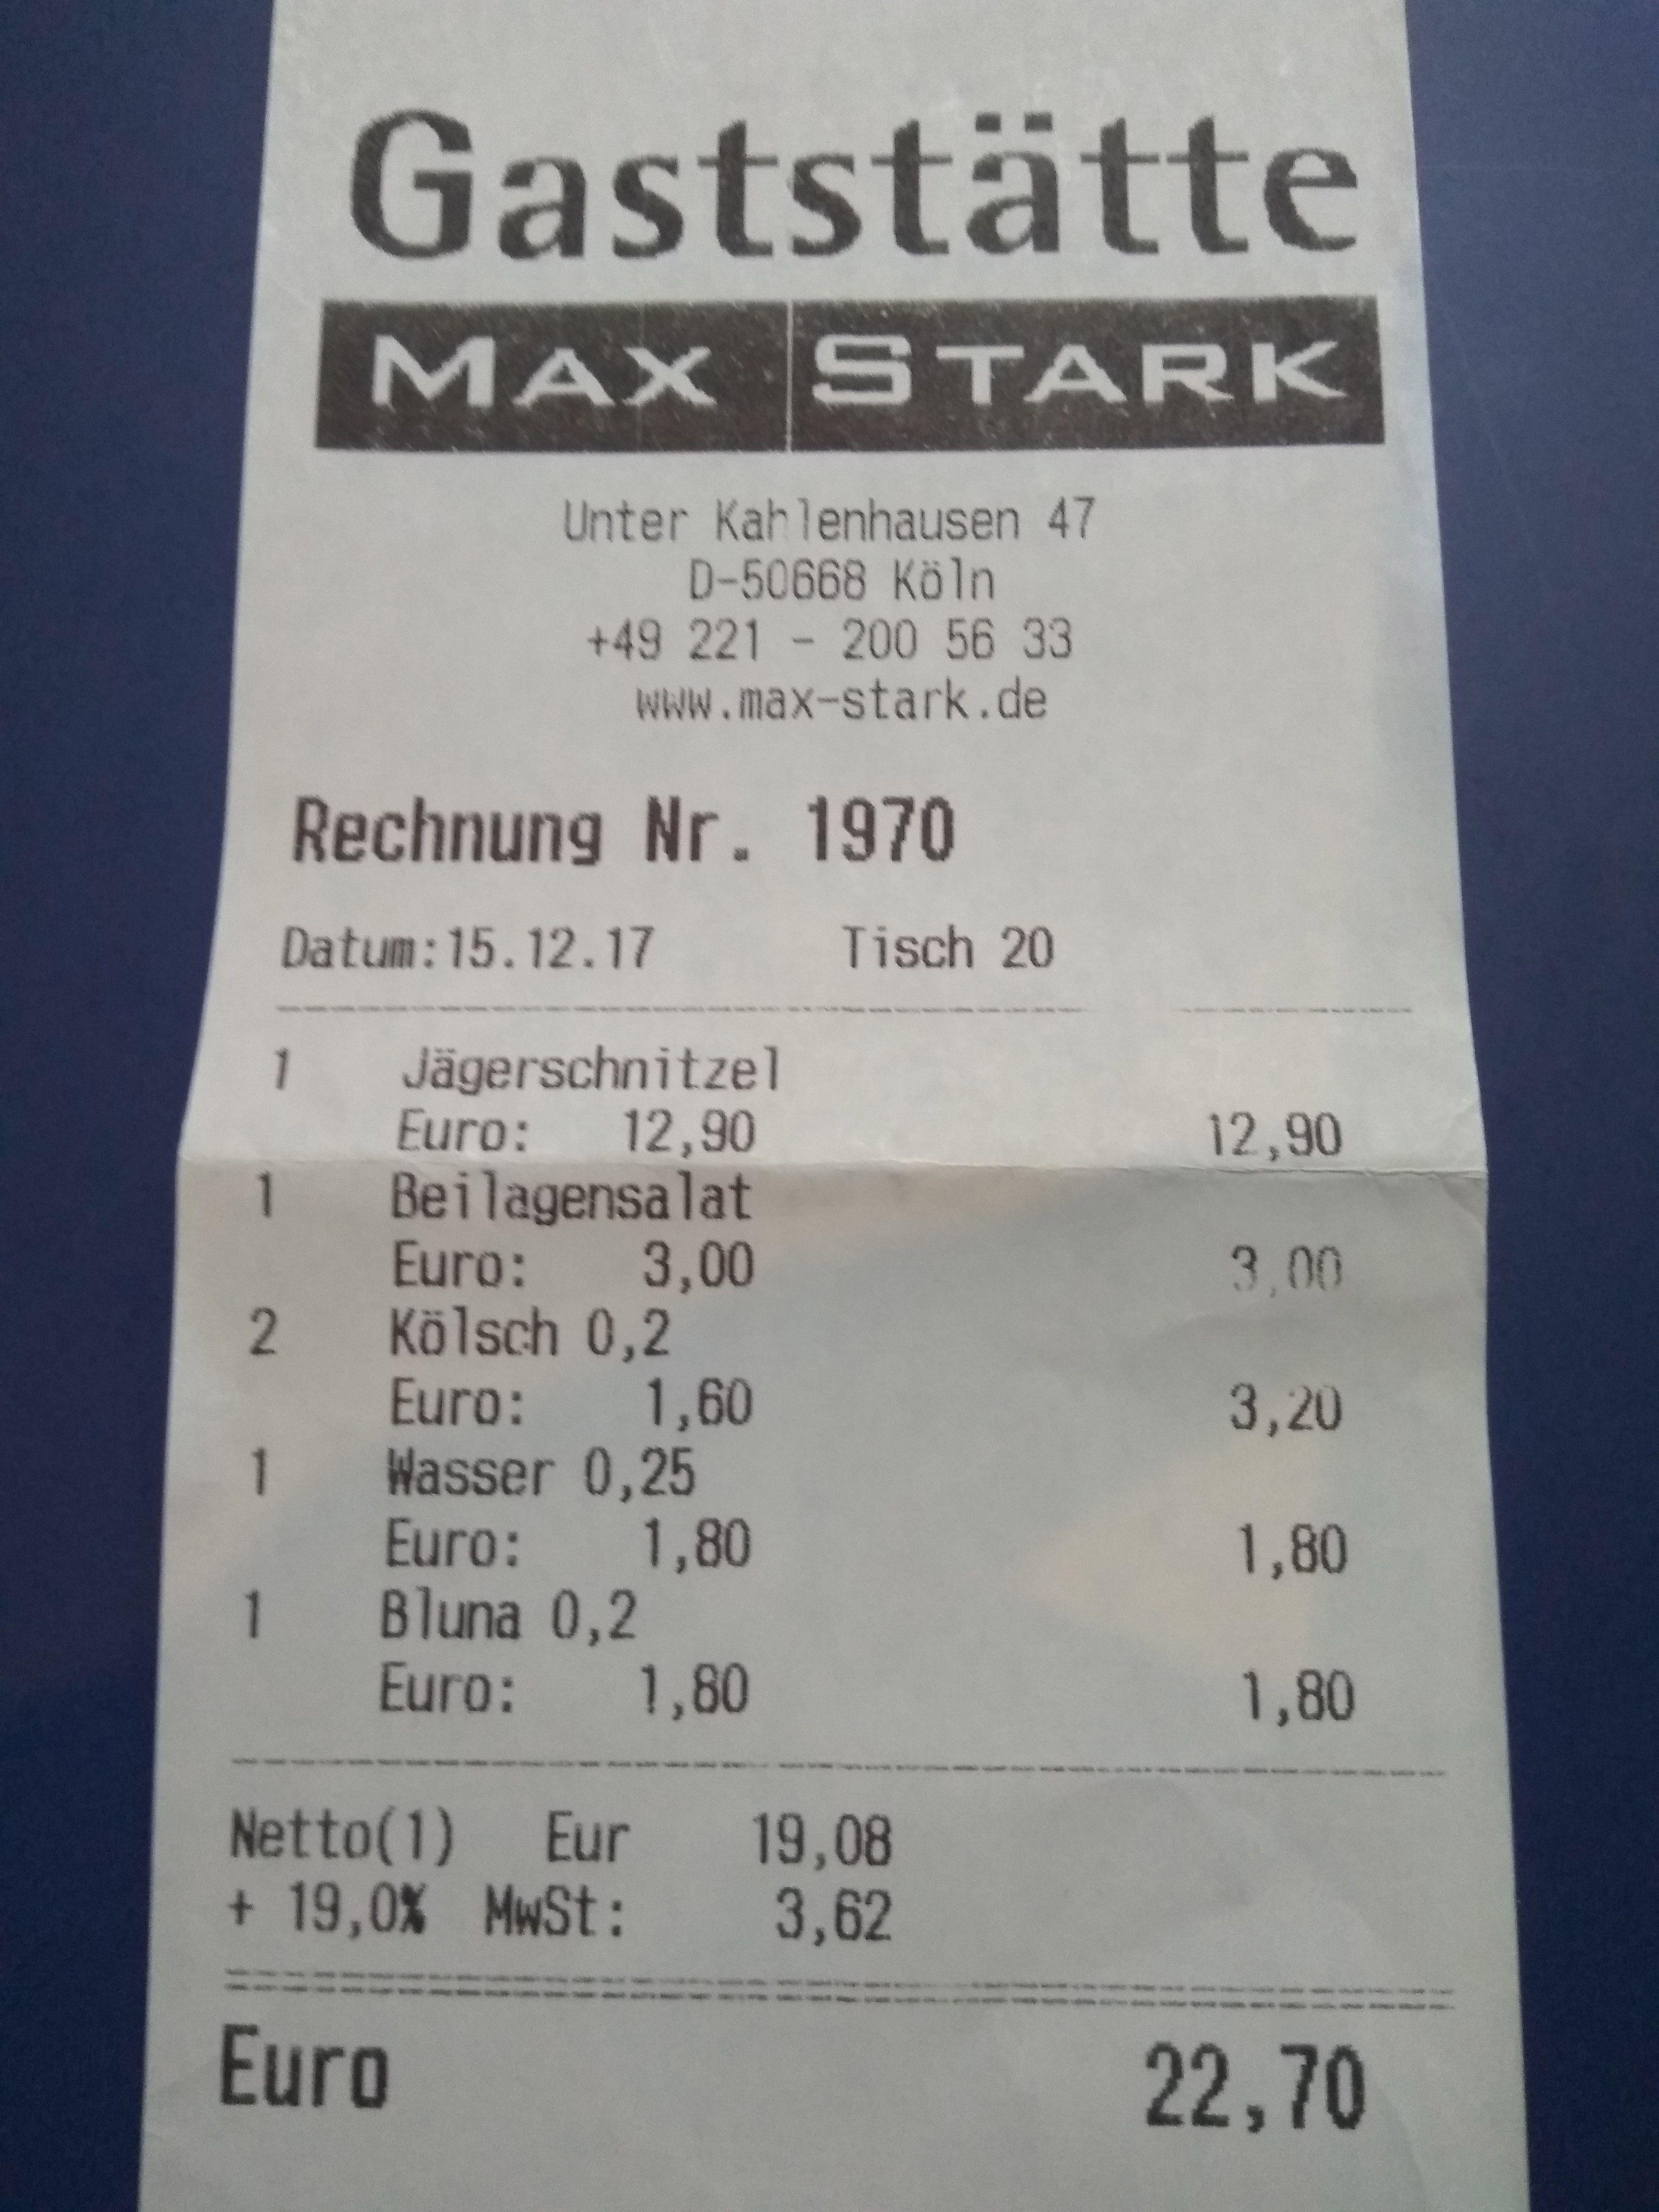 Max Stark